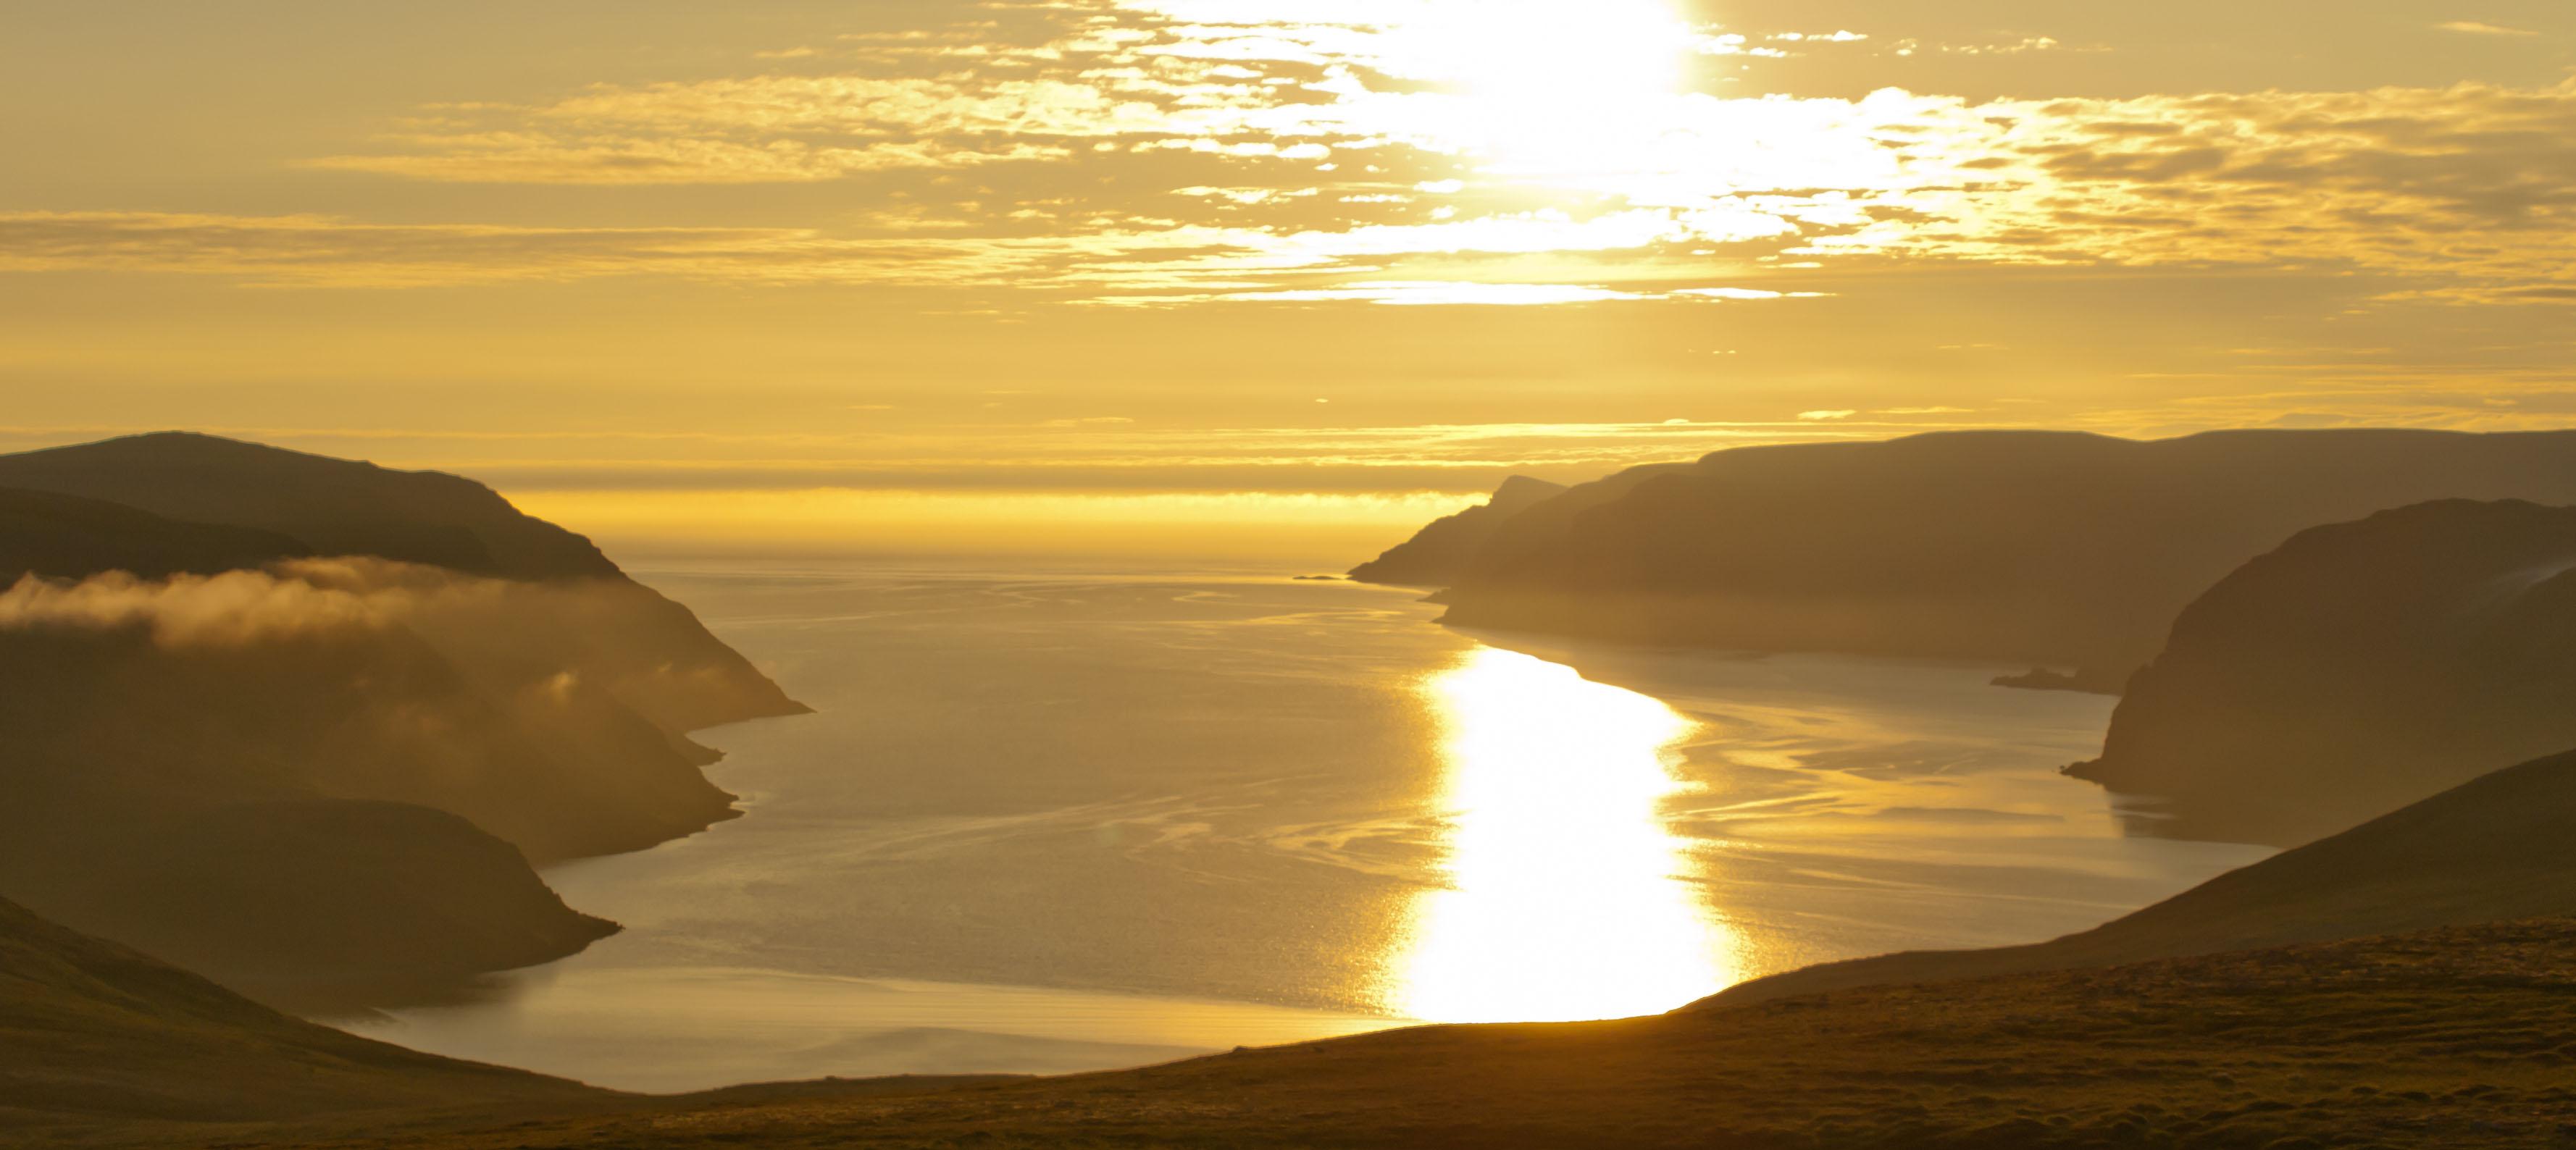 Solnedgang over Nordkap, Norge